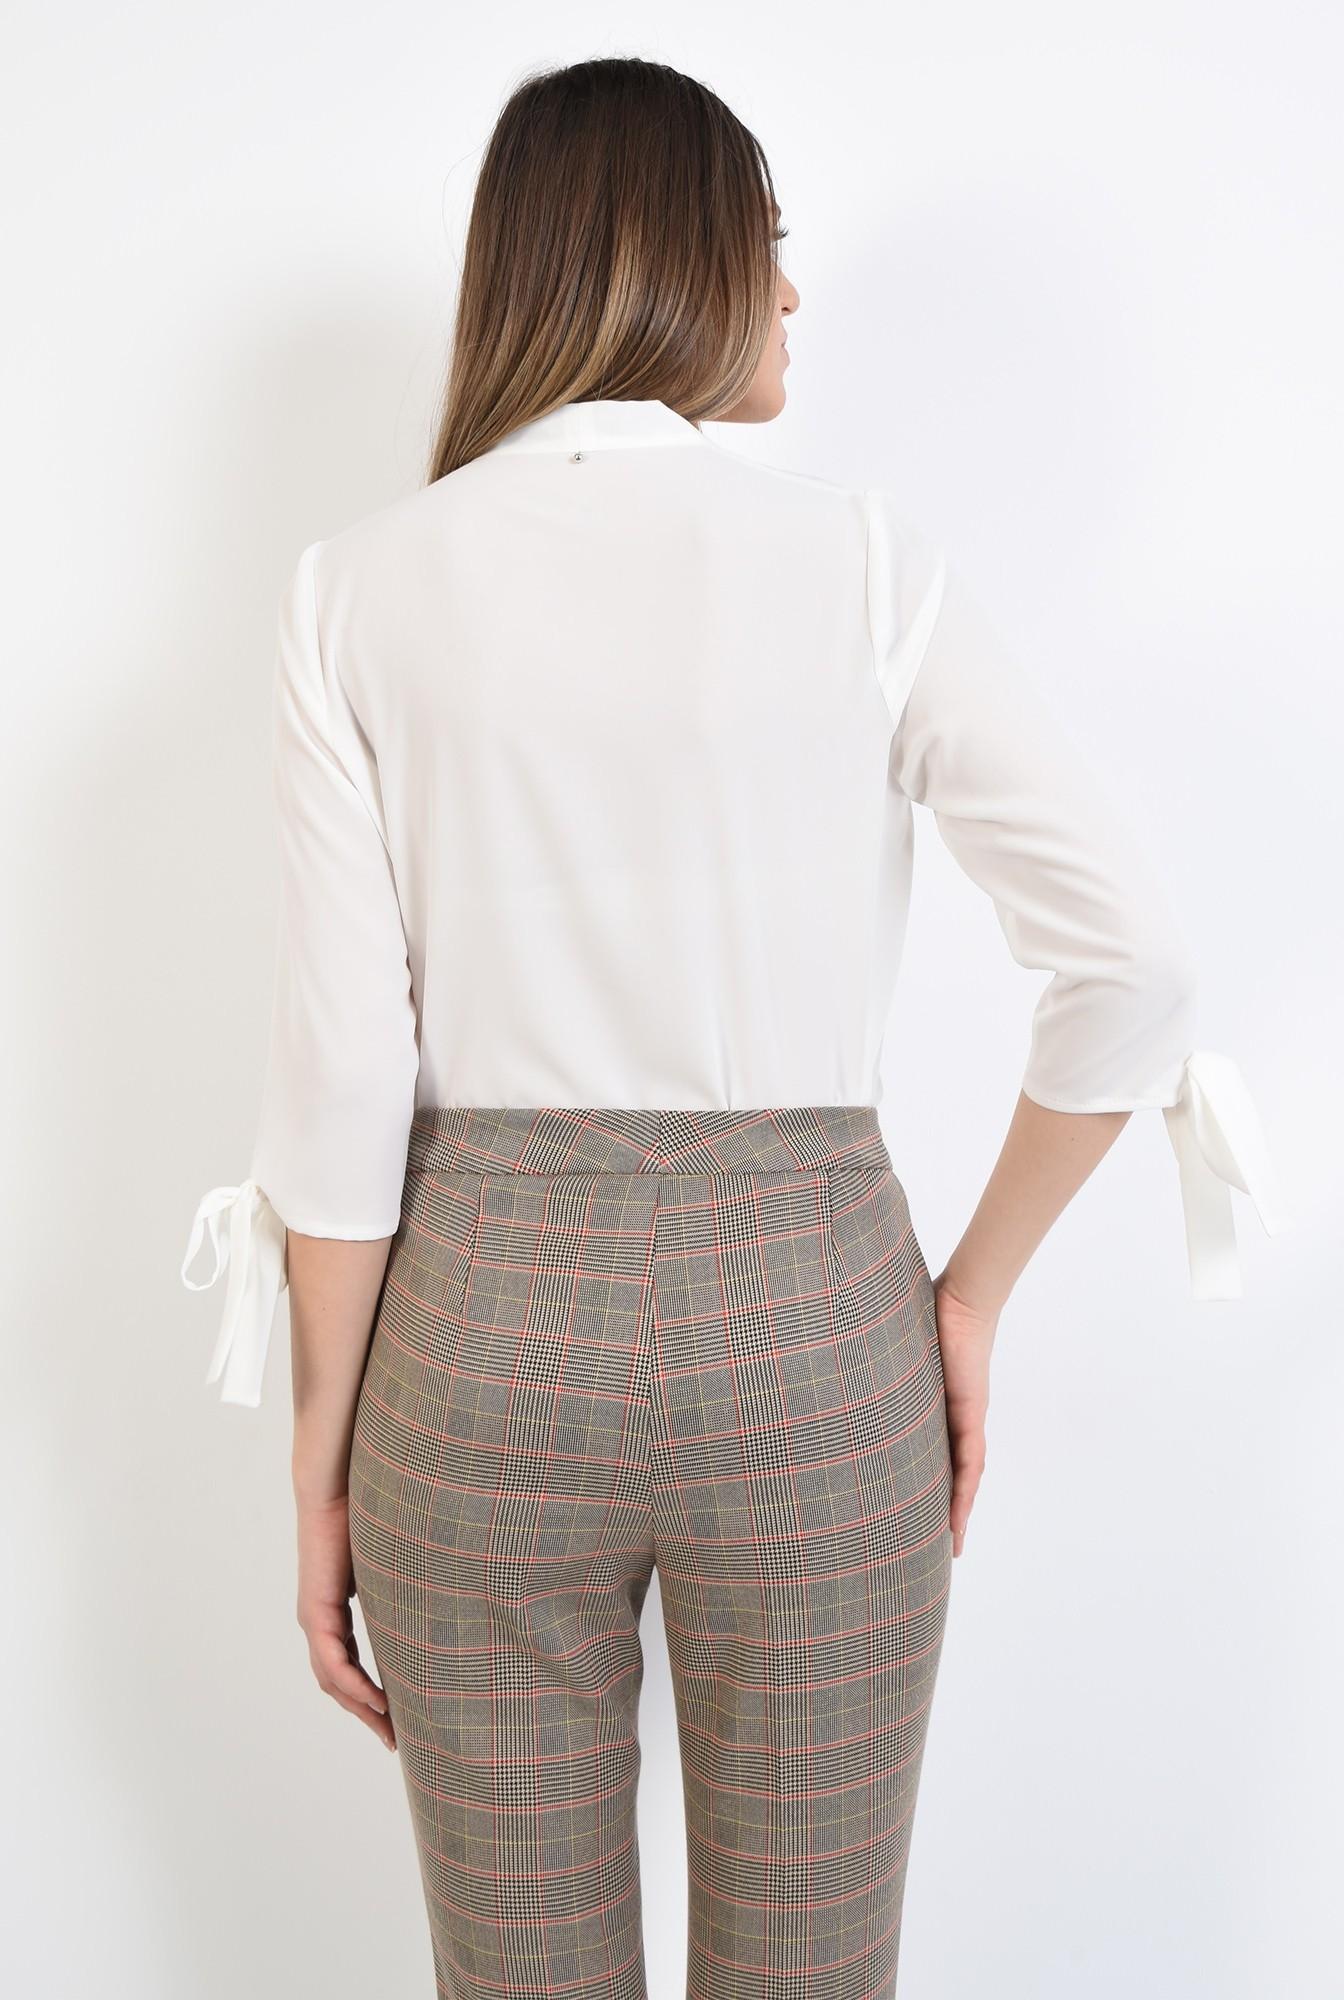 1 - 360 - pantaloni de costum, in carouri, conici, buzunare in cusatura